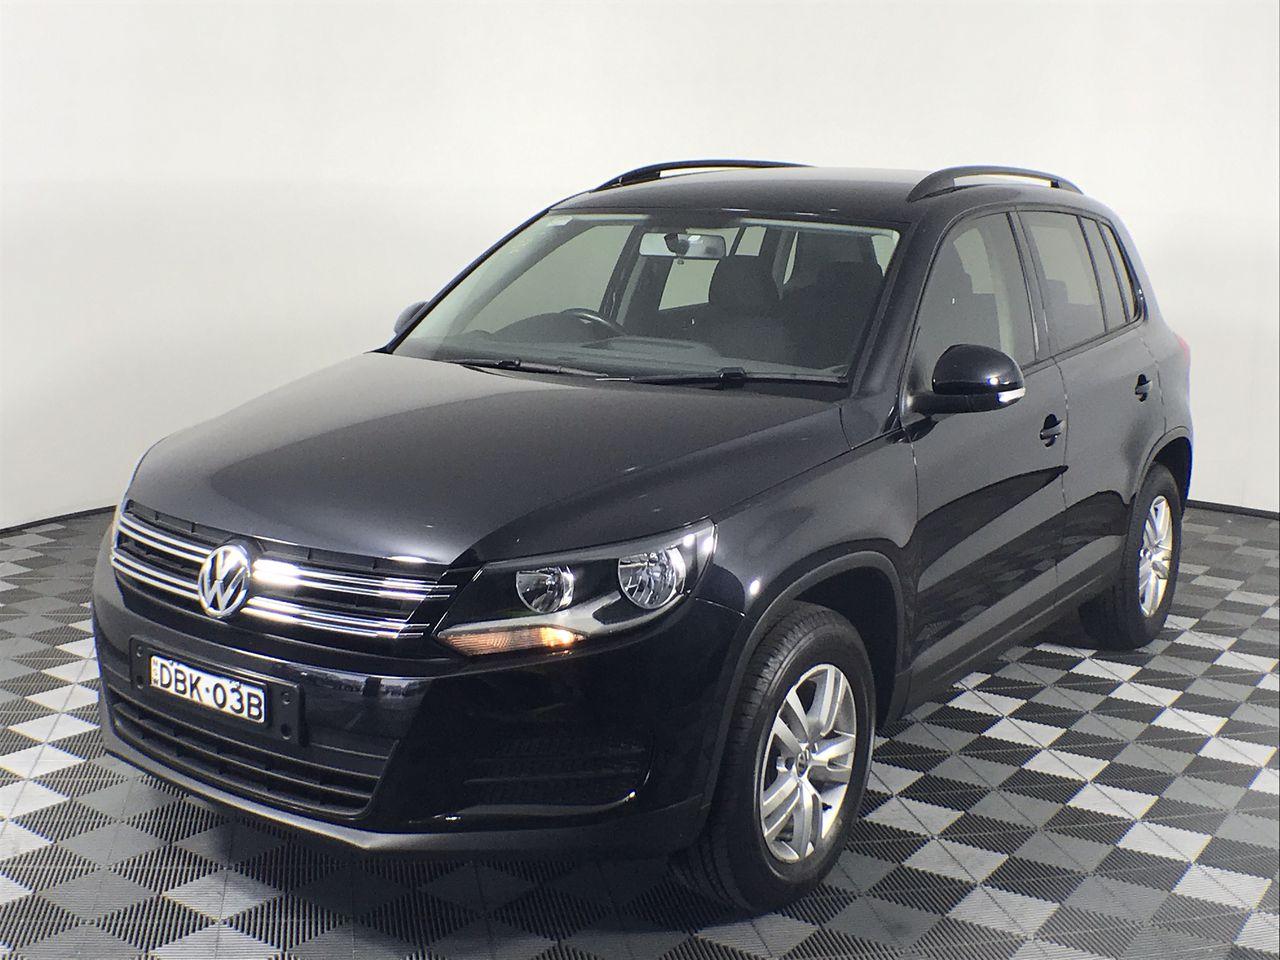 2015 Volkswagen Tiguan 118 TSI (4x2) 5N Automatic Wagon